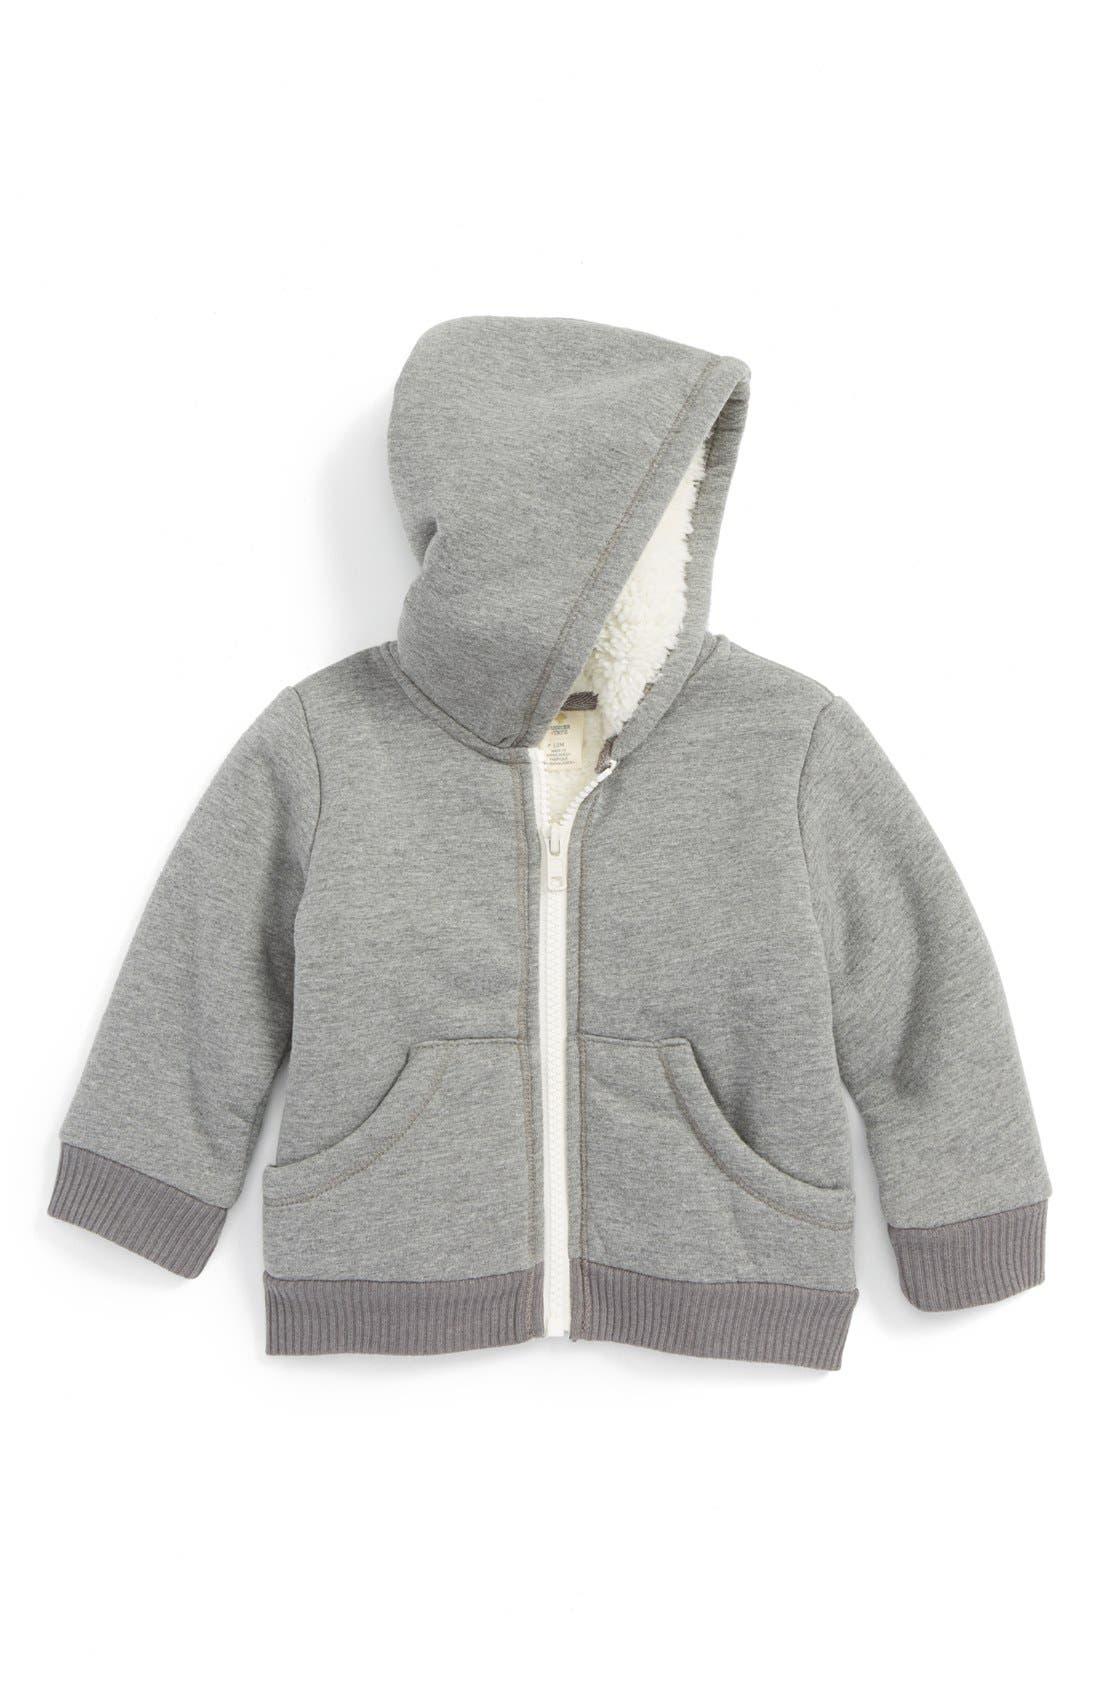 Fuzzy Lined Jacket,                             Main thumbnail 1, color,                             030